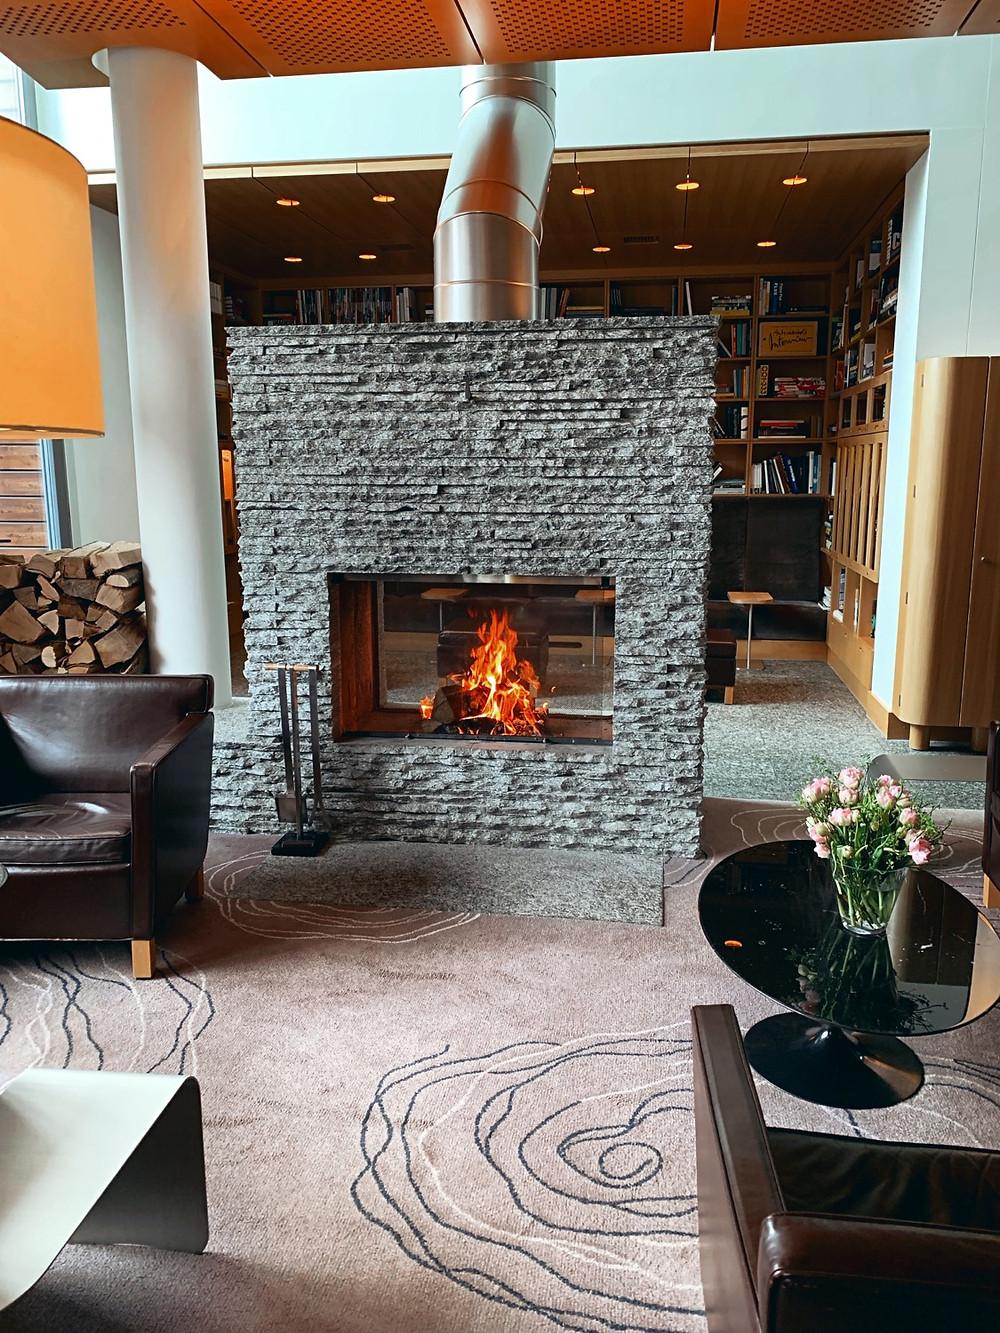 The Omnia Lobby | Zermatt